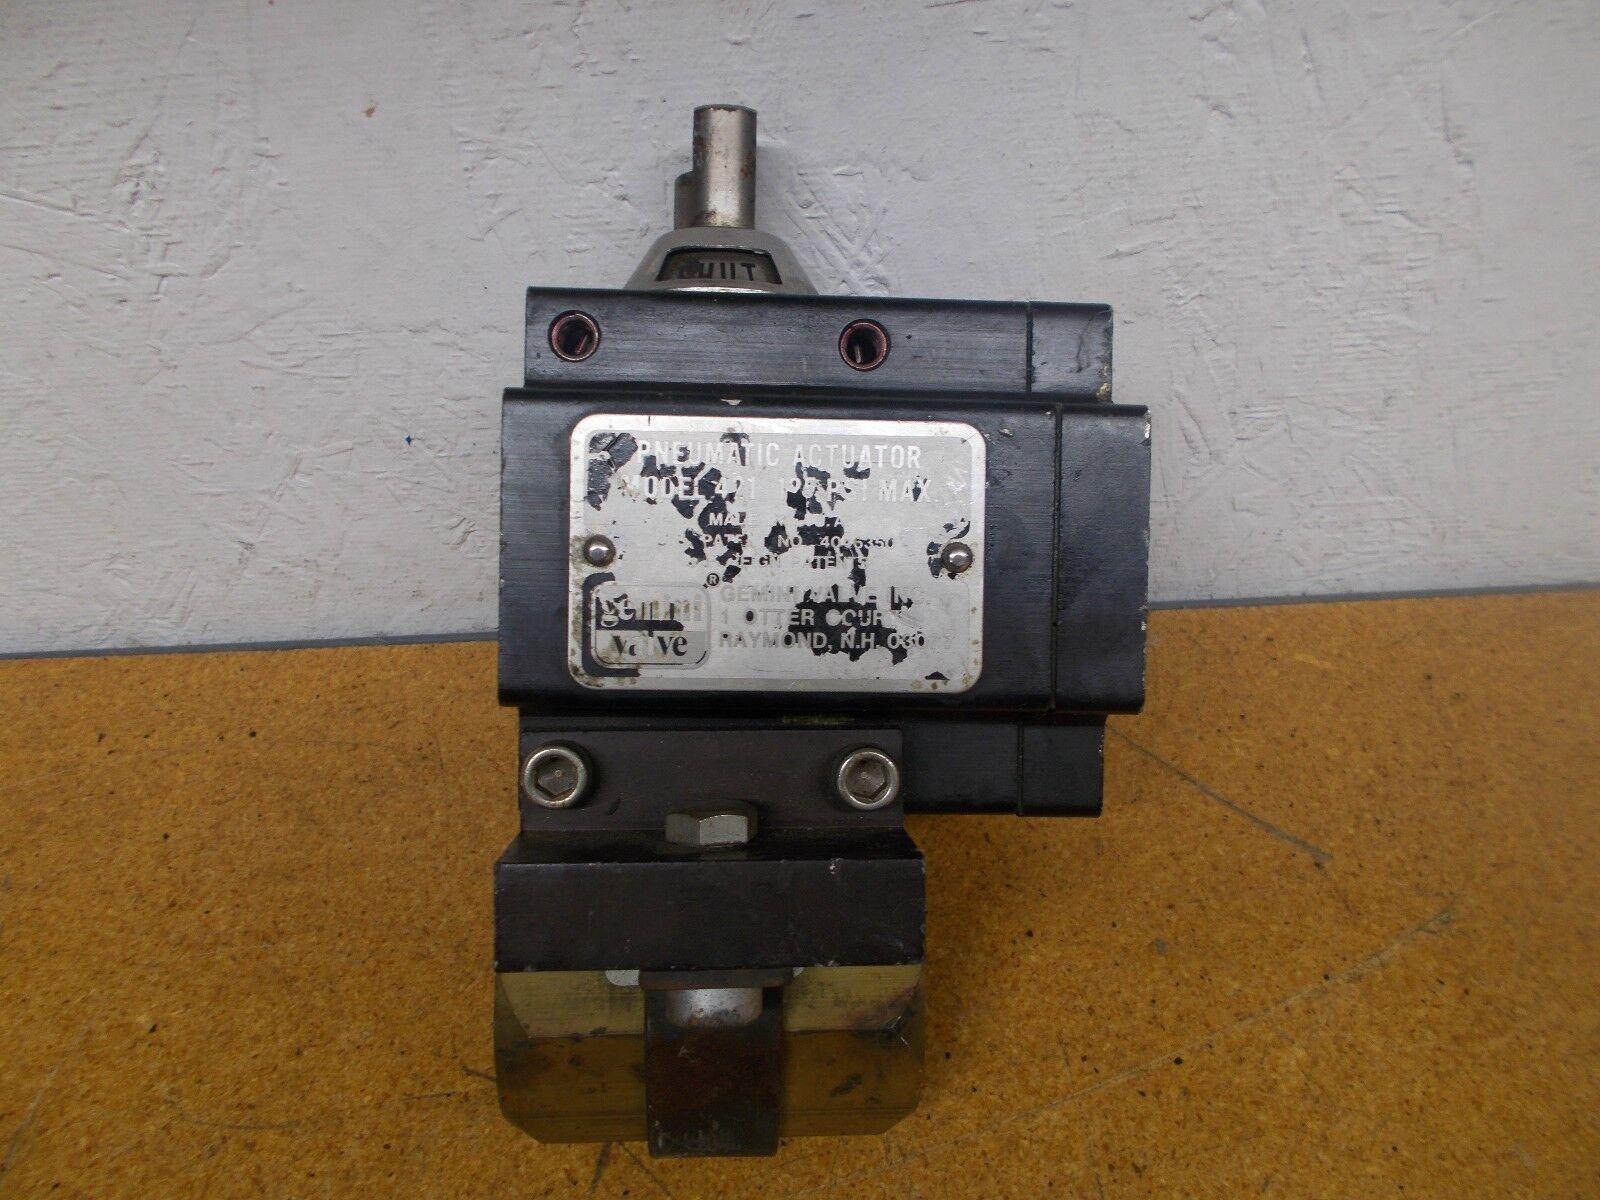 Gemini Valve B411 Pneumatic Actuator 125 PSI